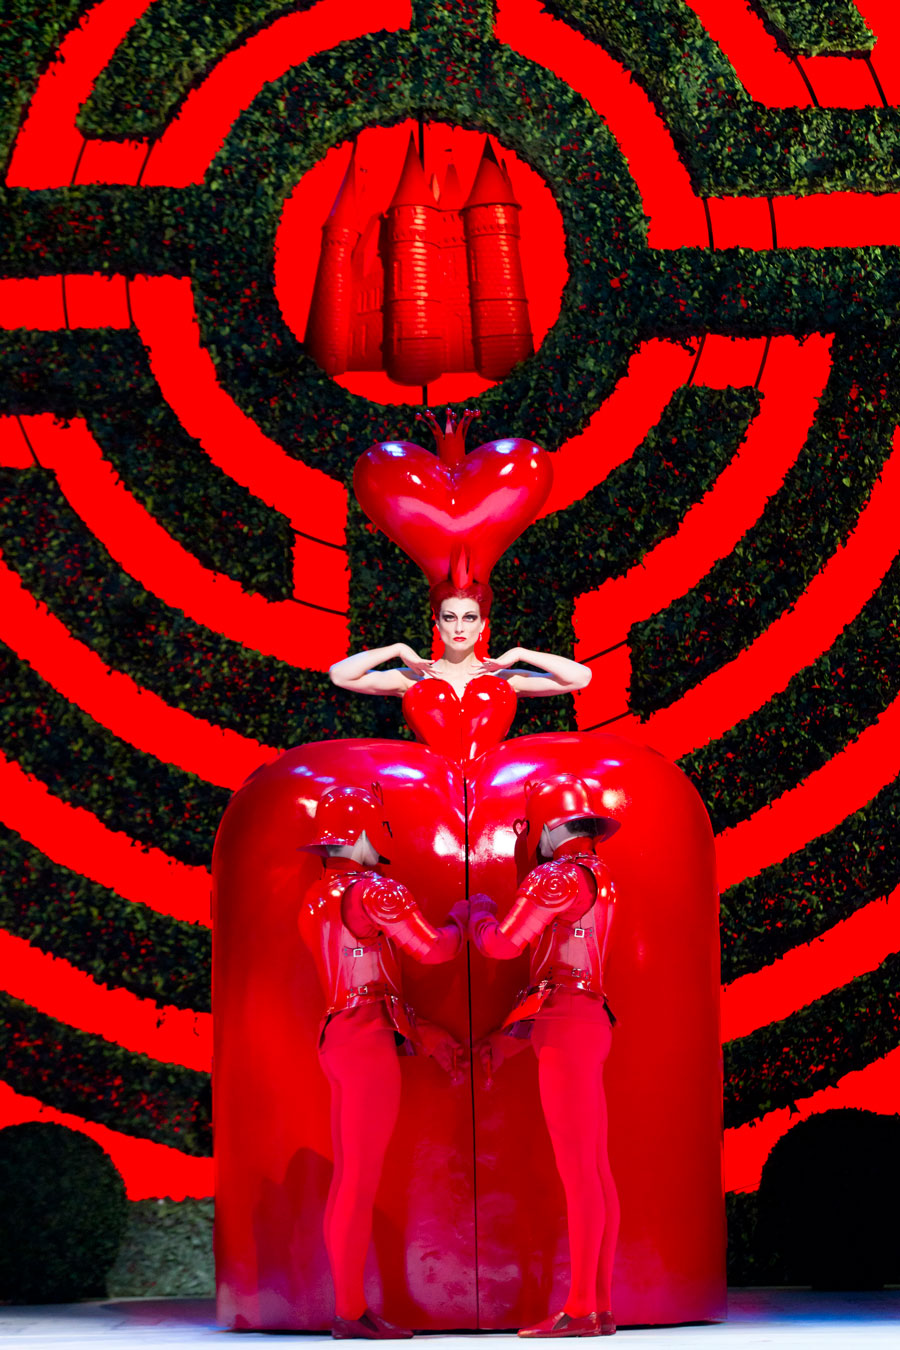 Alice In Wonderland. The Royal Ballet. Zenaida Yanowsky ©roh, Johan Persson, 2011.